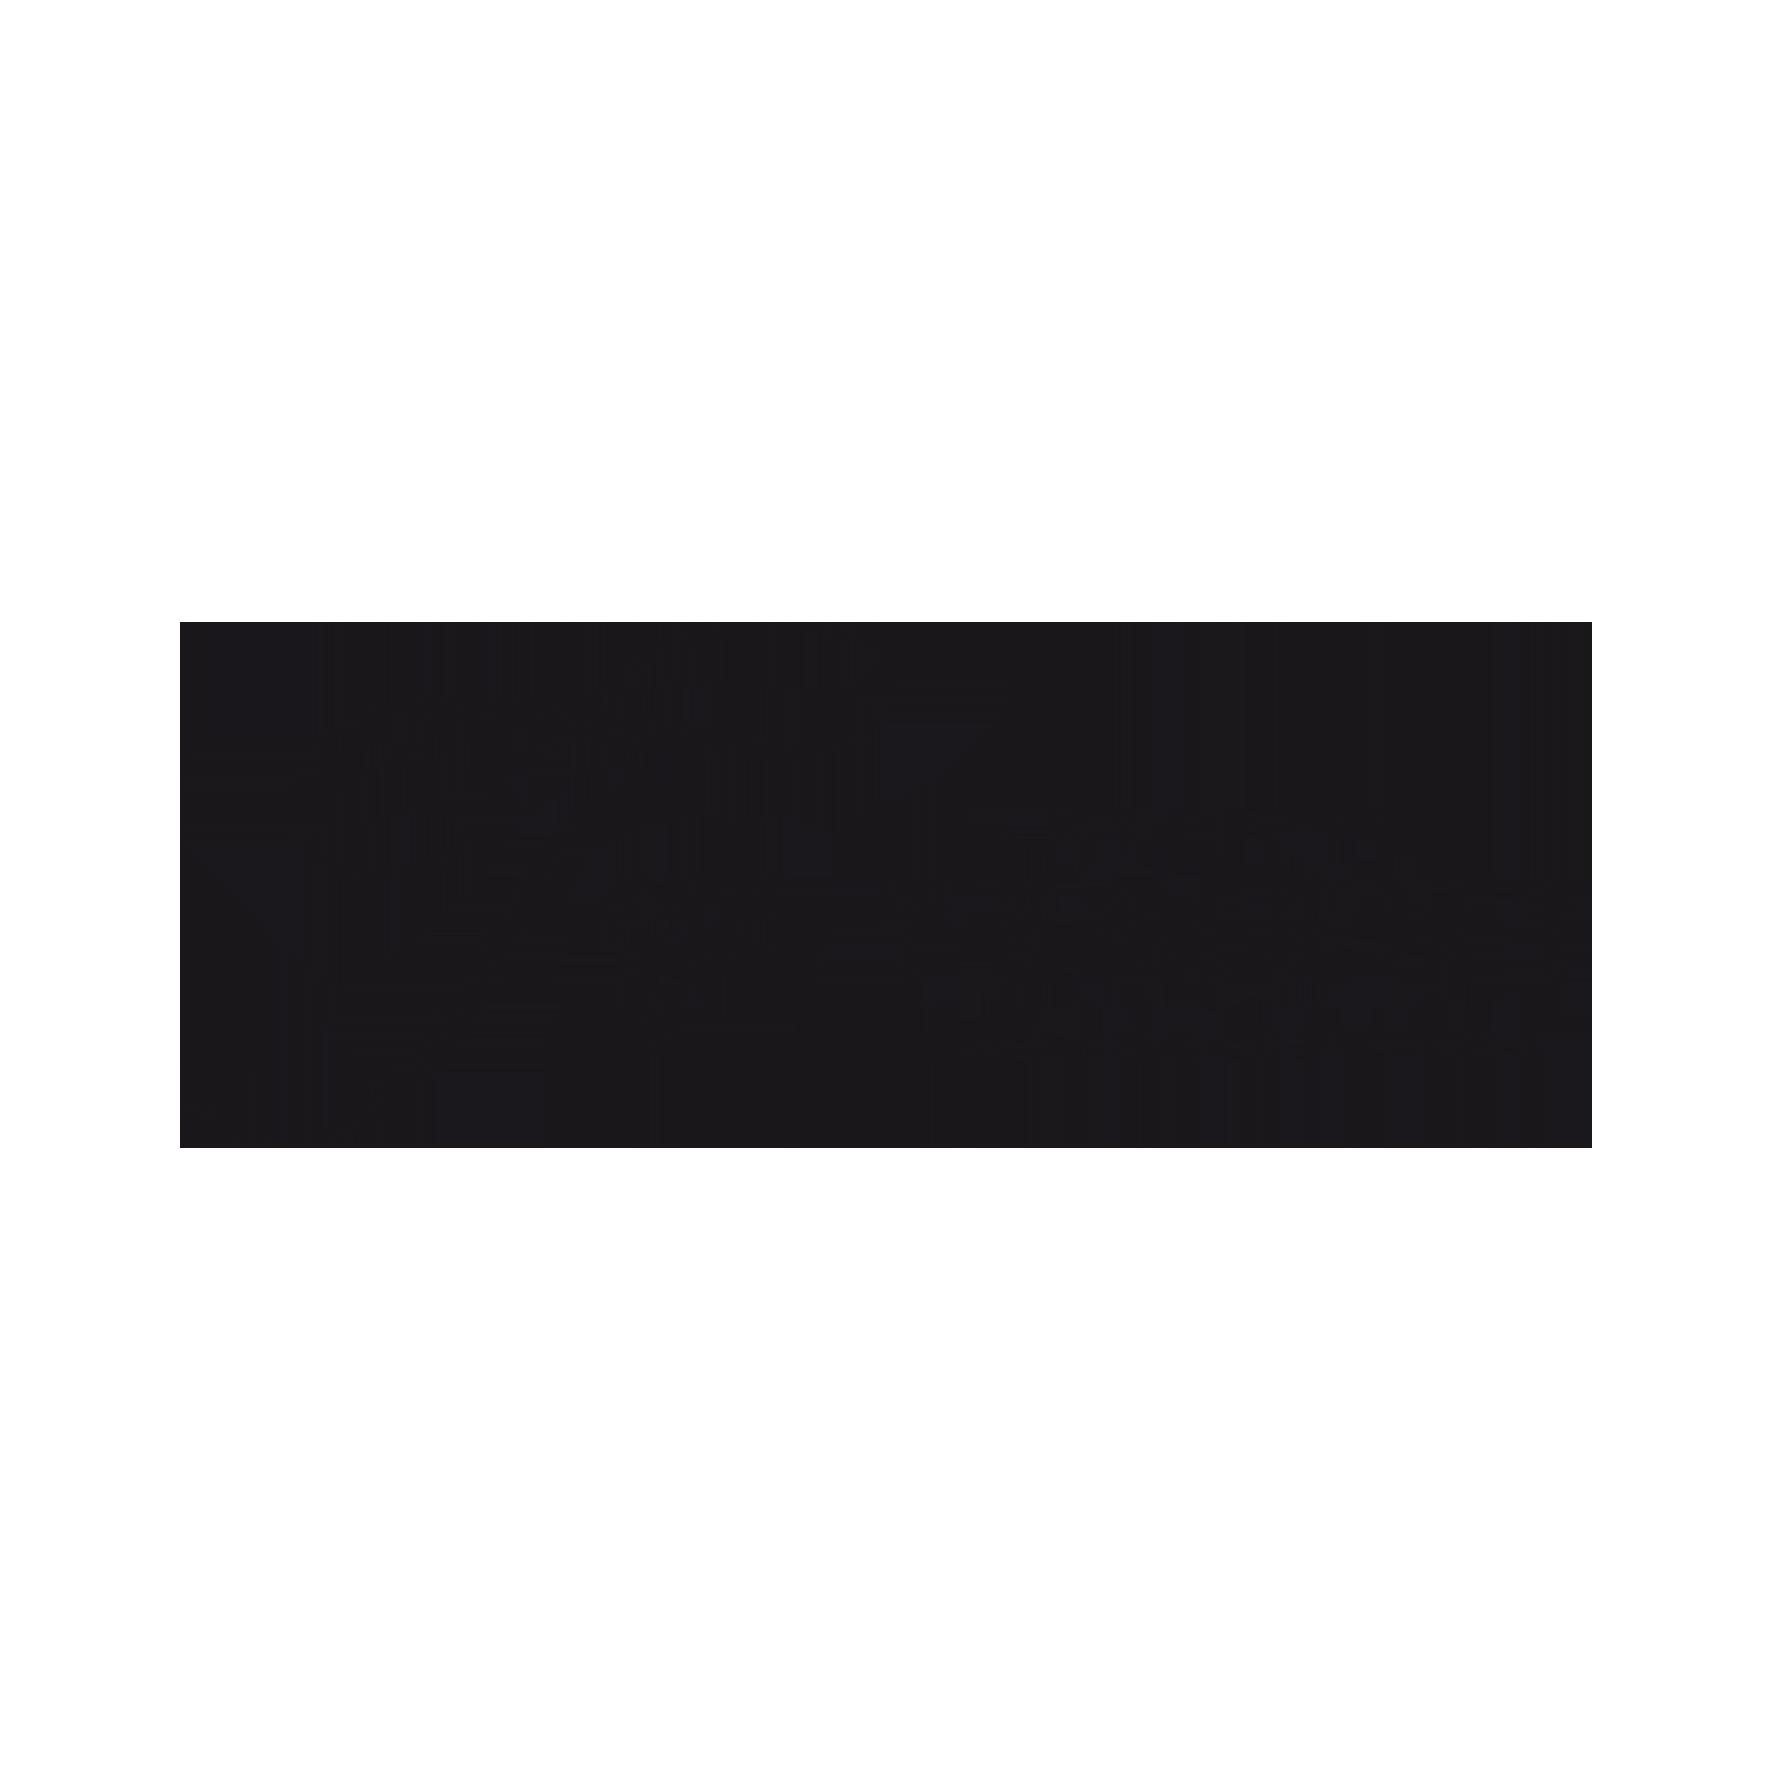 WEINGUT TEMENT